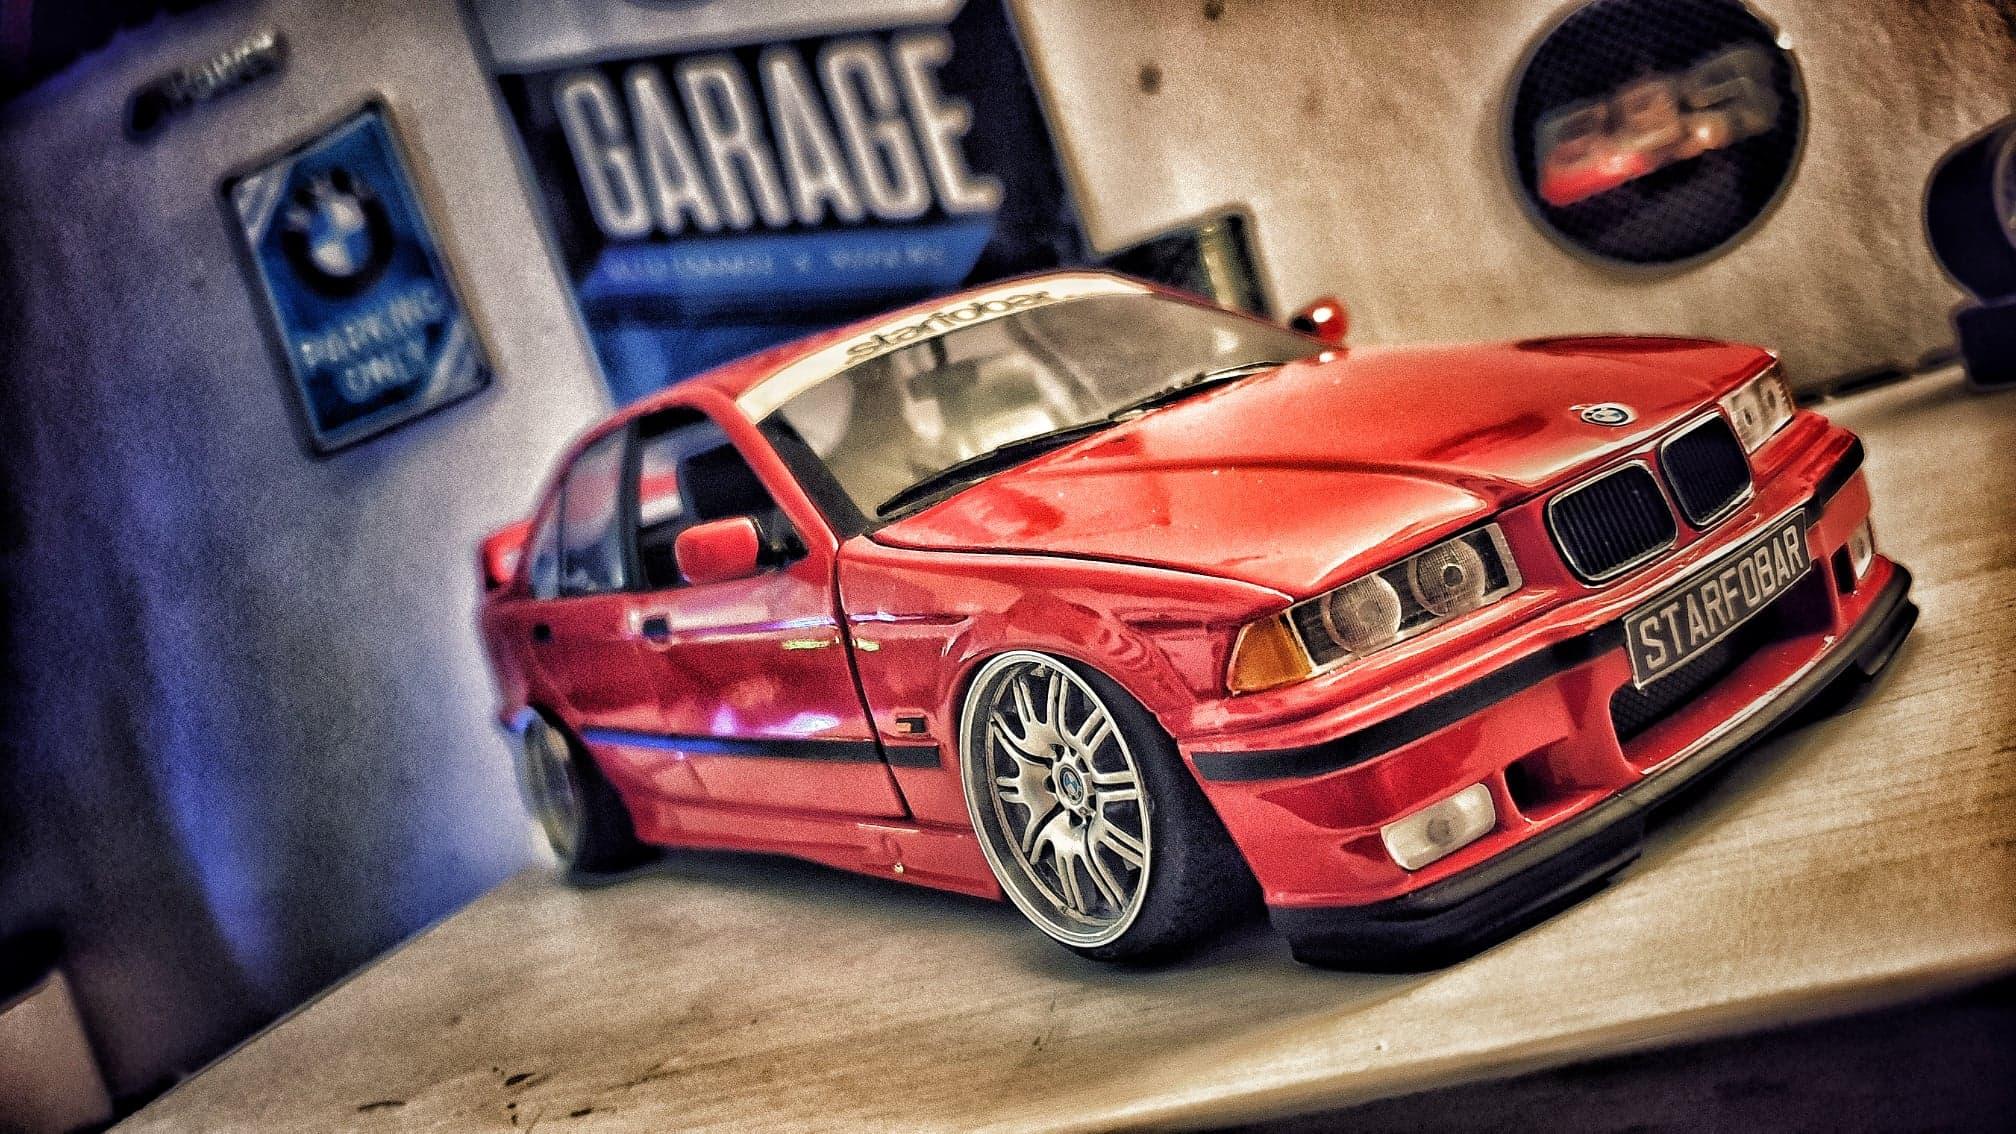 Bmw 318 E36 1/18 Ut Models red sedan with big offset wheels tuning diecast